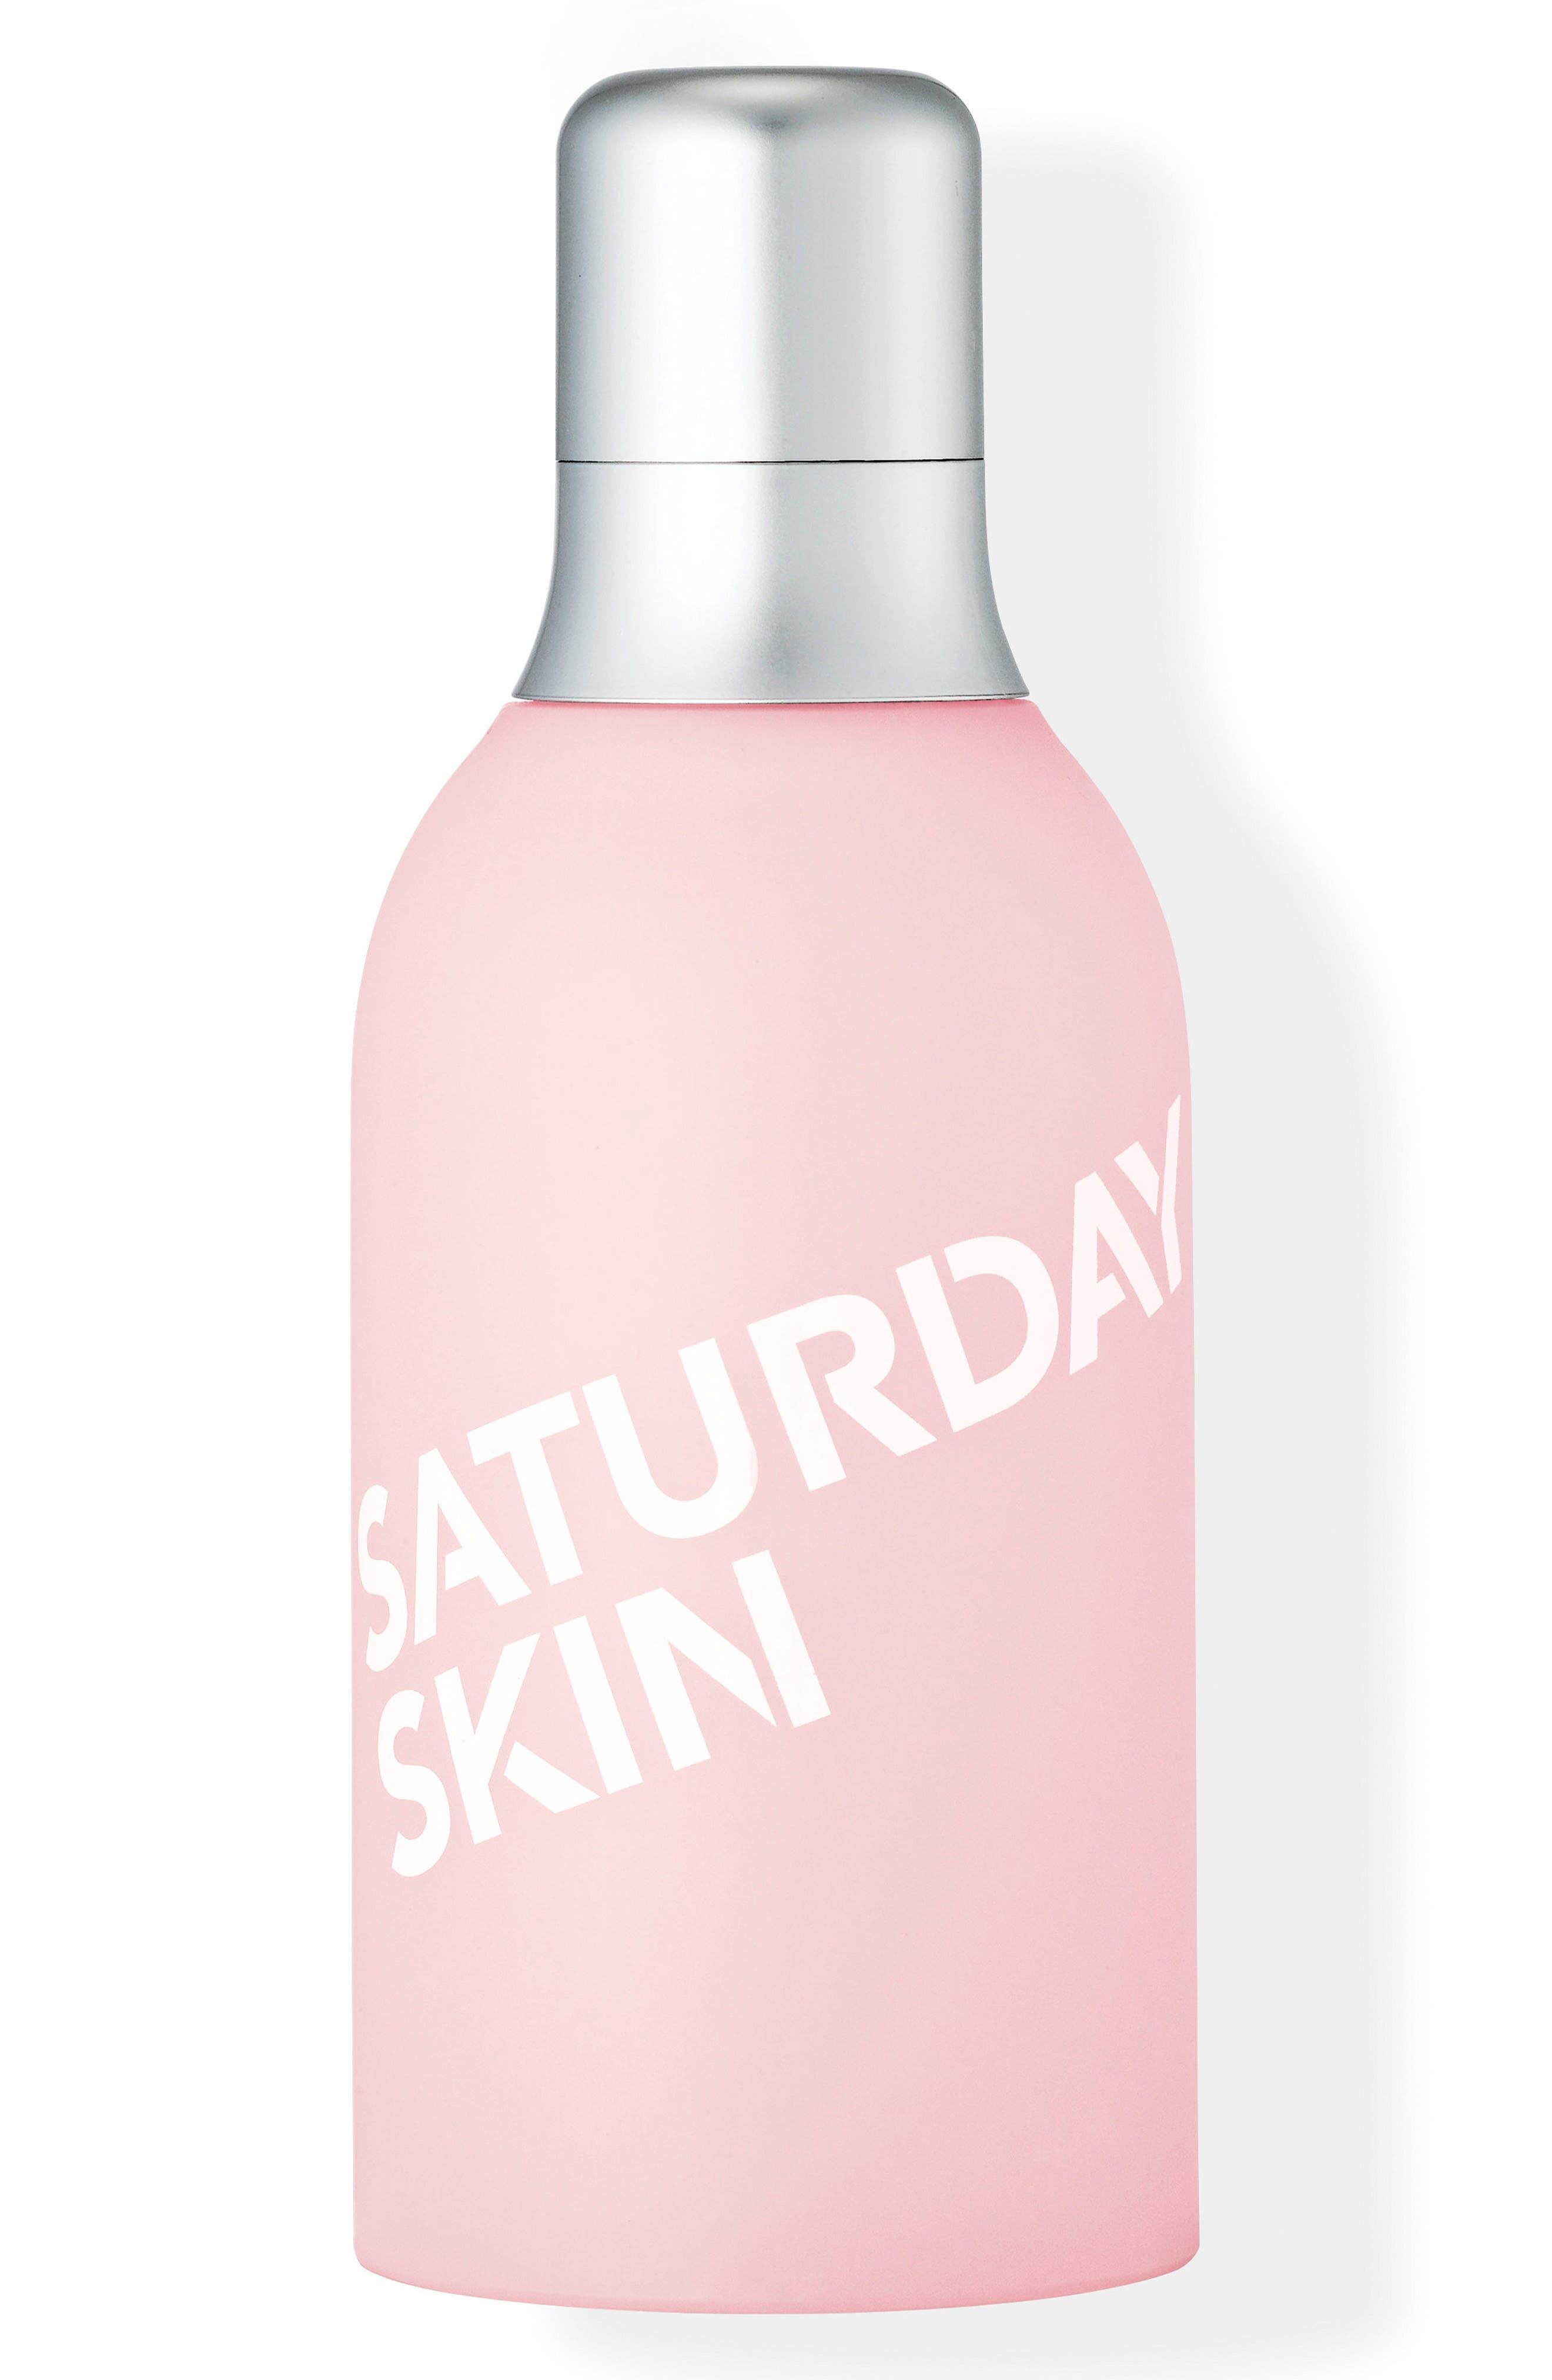 Main Image - Saturday Skin Daily Dew Hydrating Essence Mist